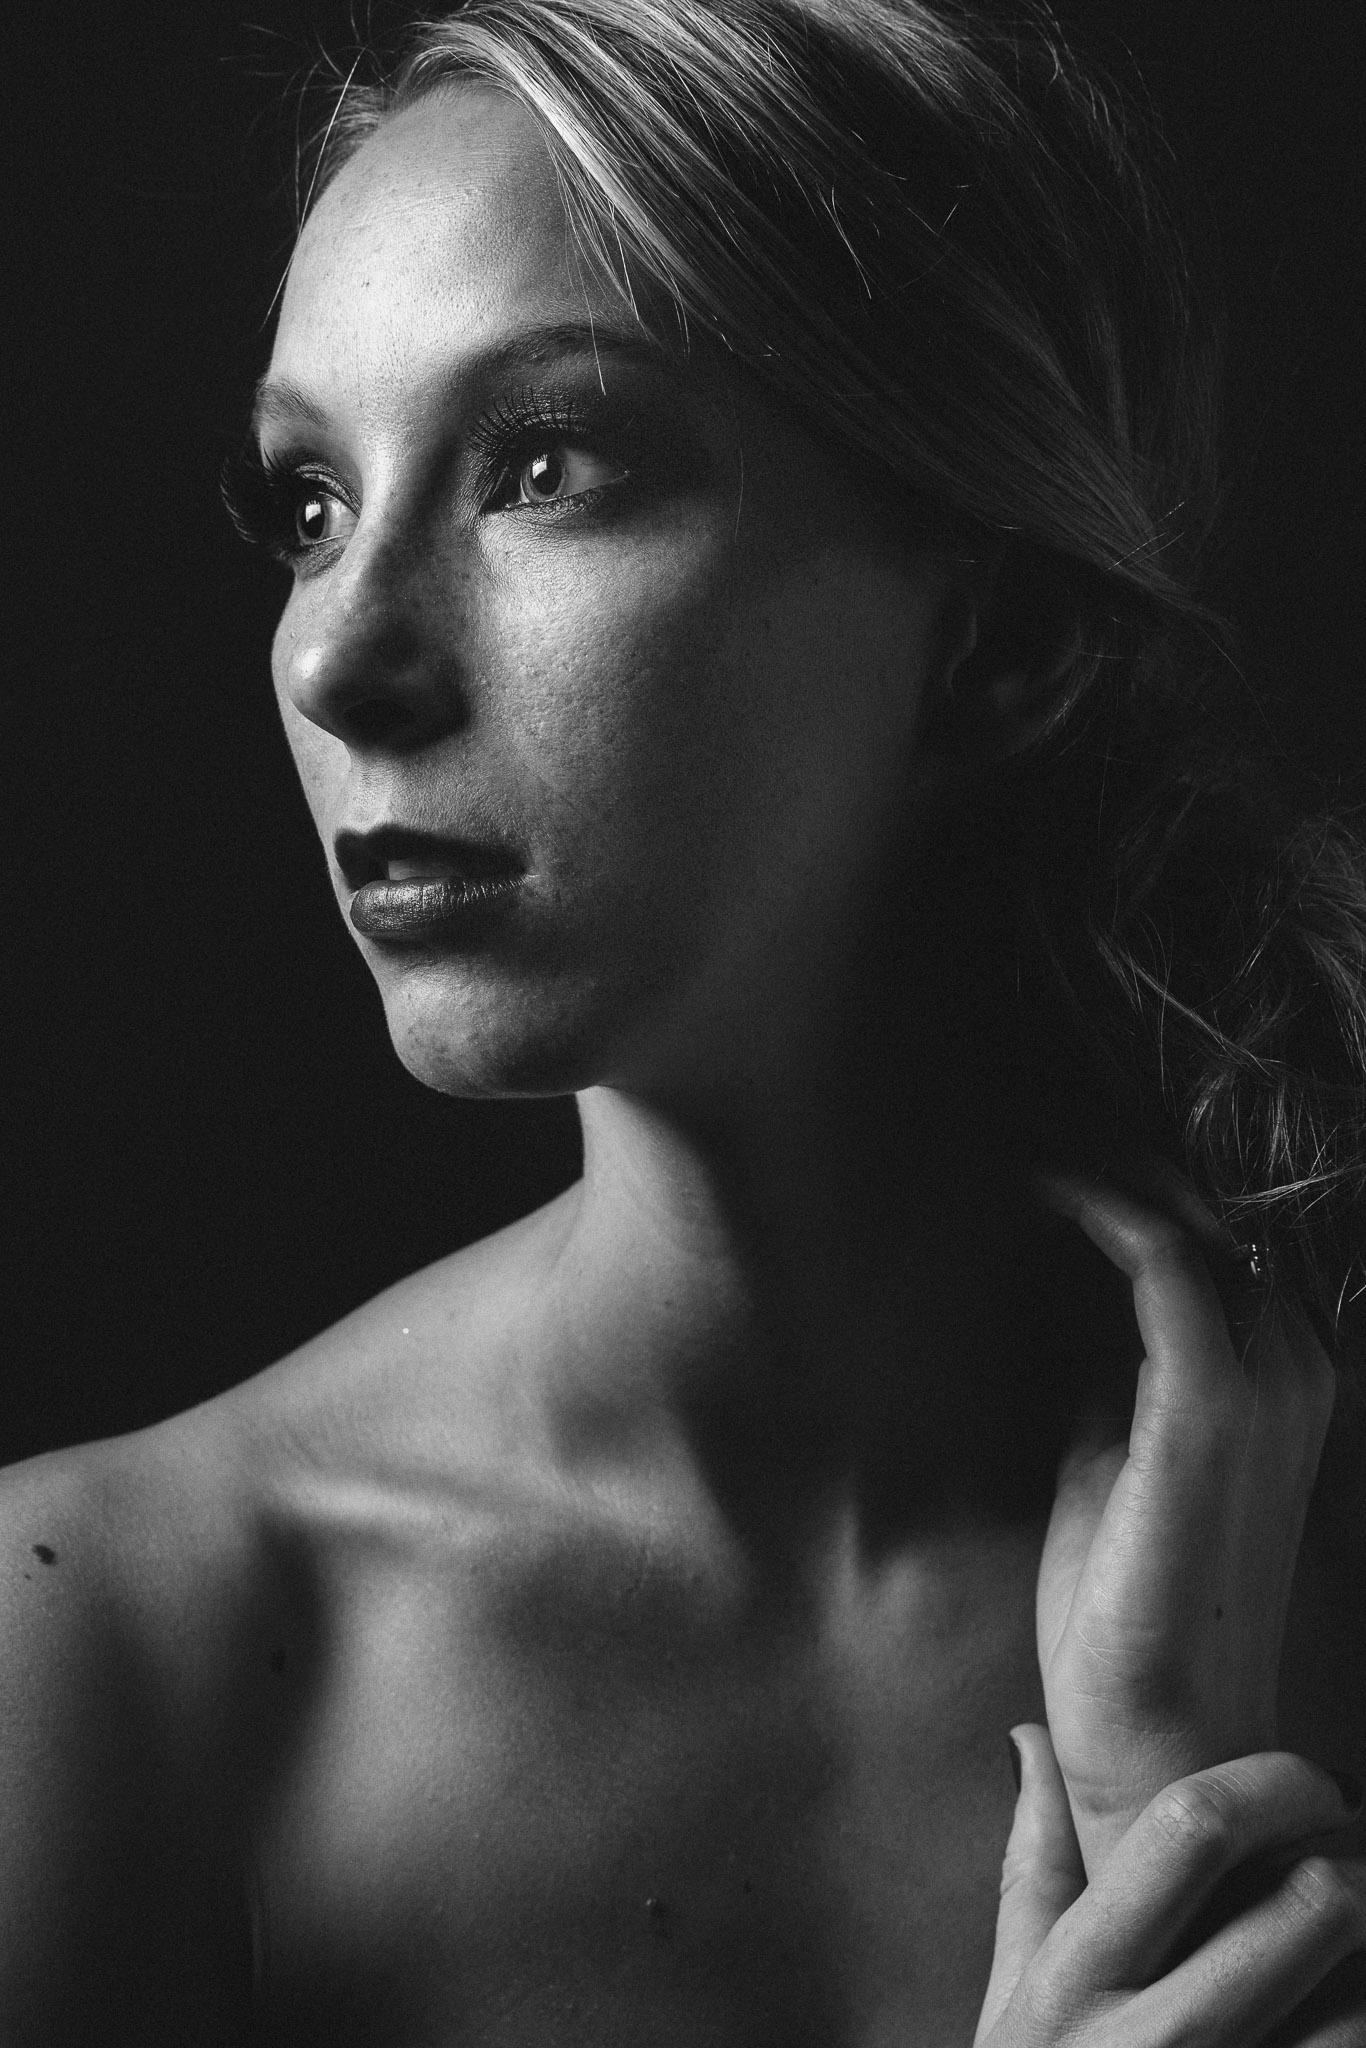 Model:Nicolette Grenier  Cameras used: Sony A7  Lens:Sonnar T* FE 55mm F1.8 ZA